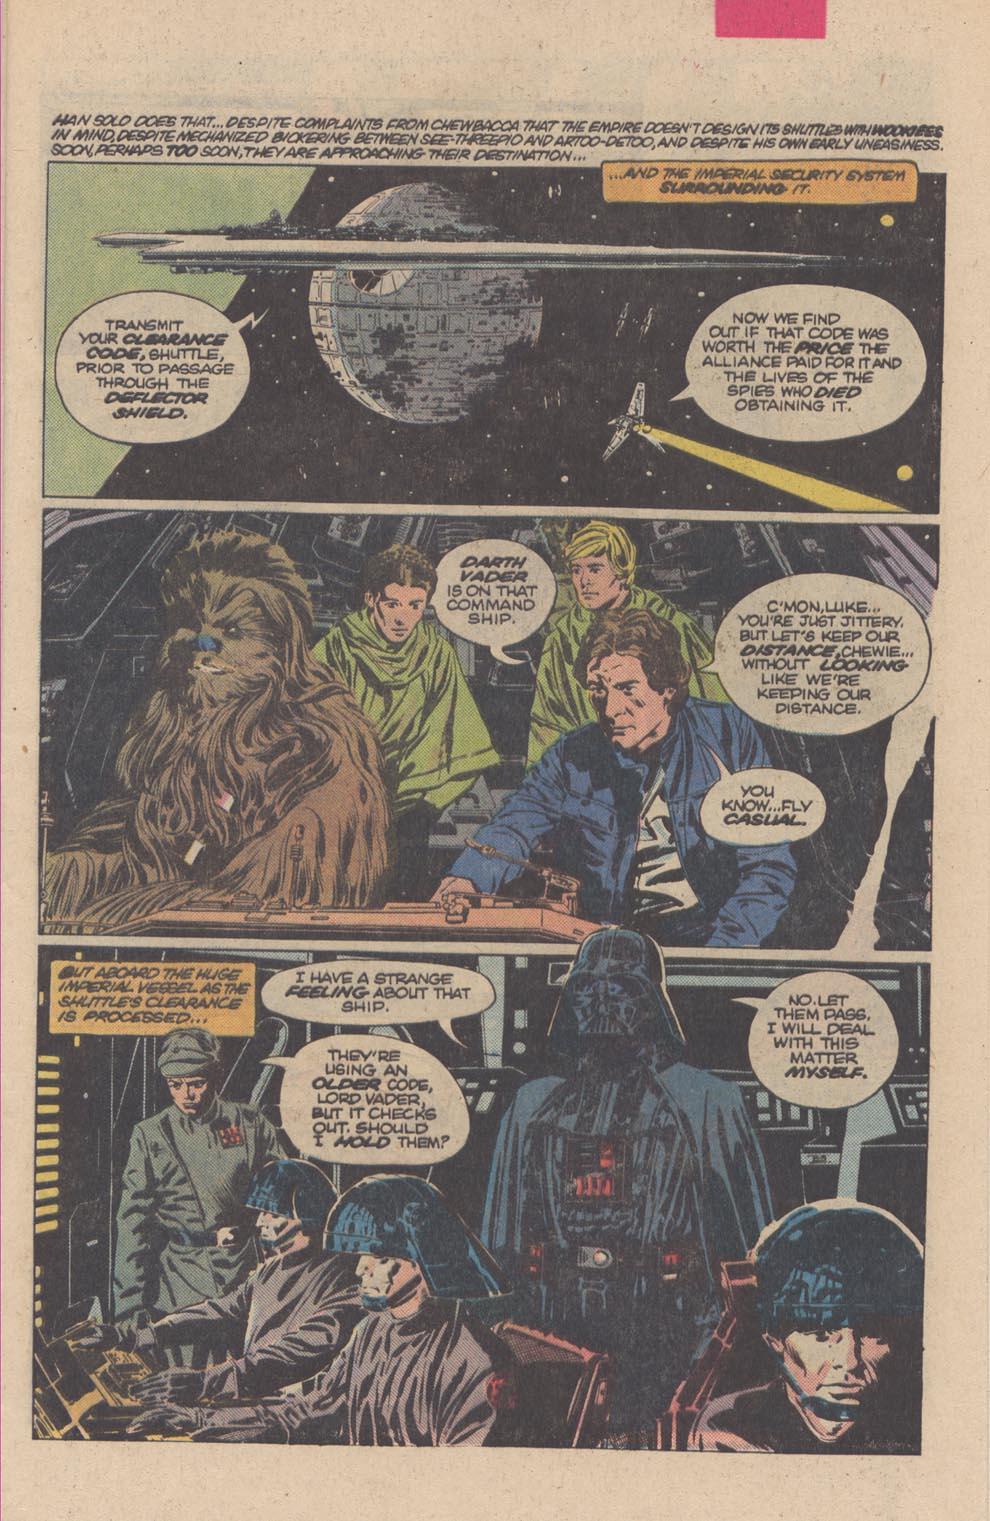 Read online Star Wars: Return of the Jedi comic -  Issue #3 - 8